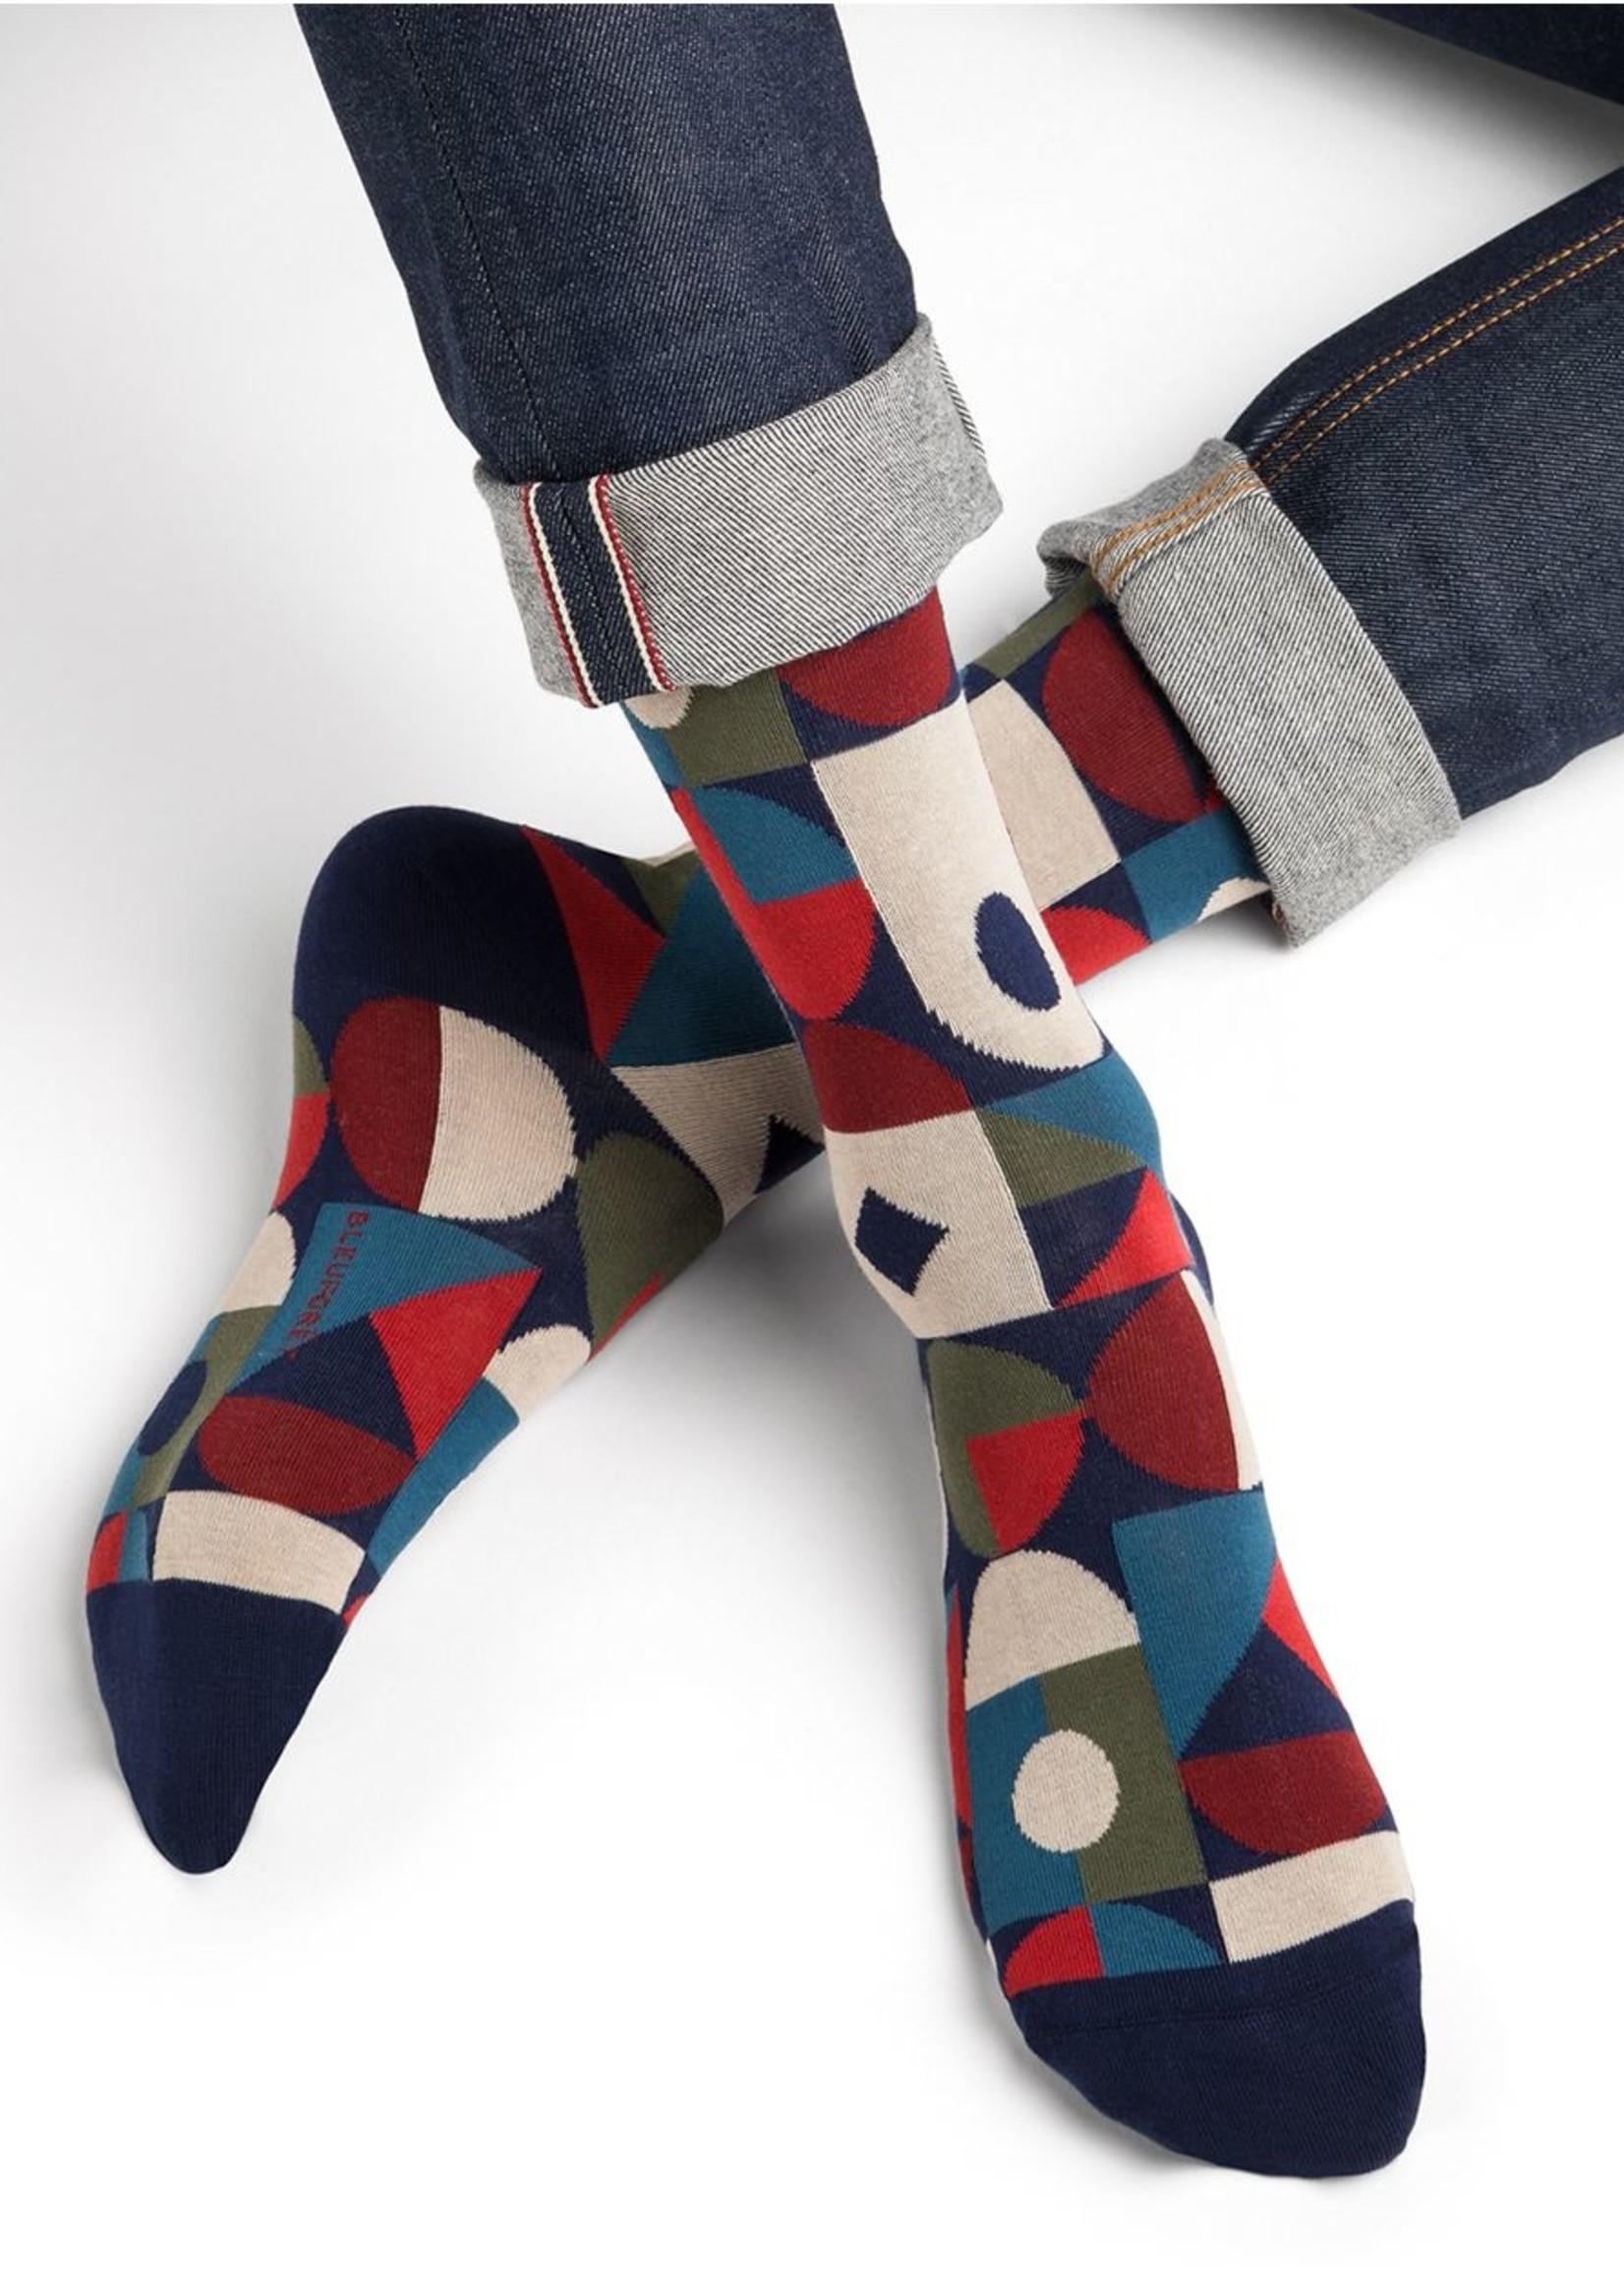 Bleuforet Men's Egyptian Cotton Geometric Patterned Sock